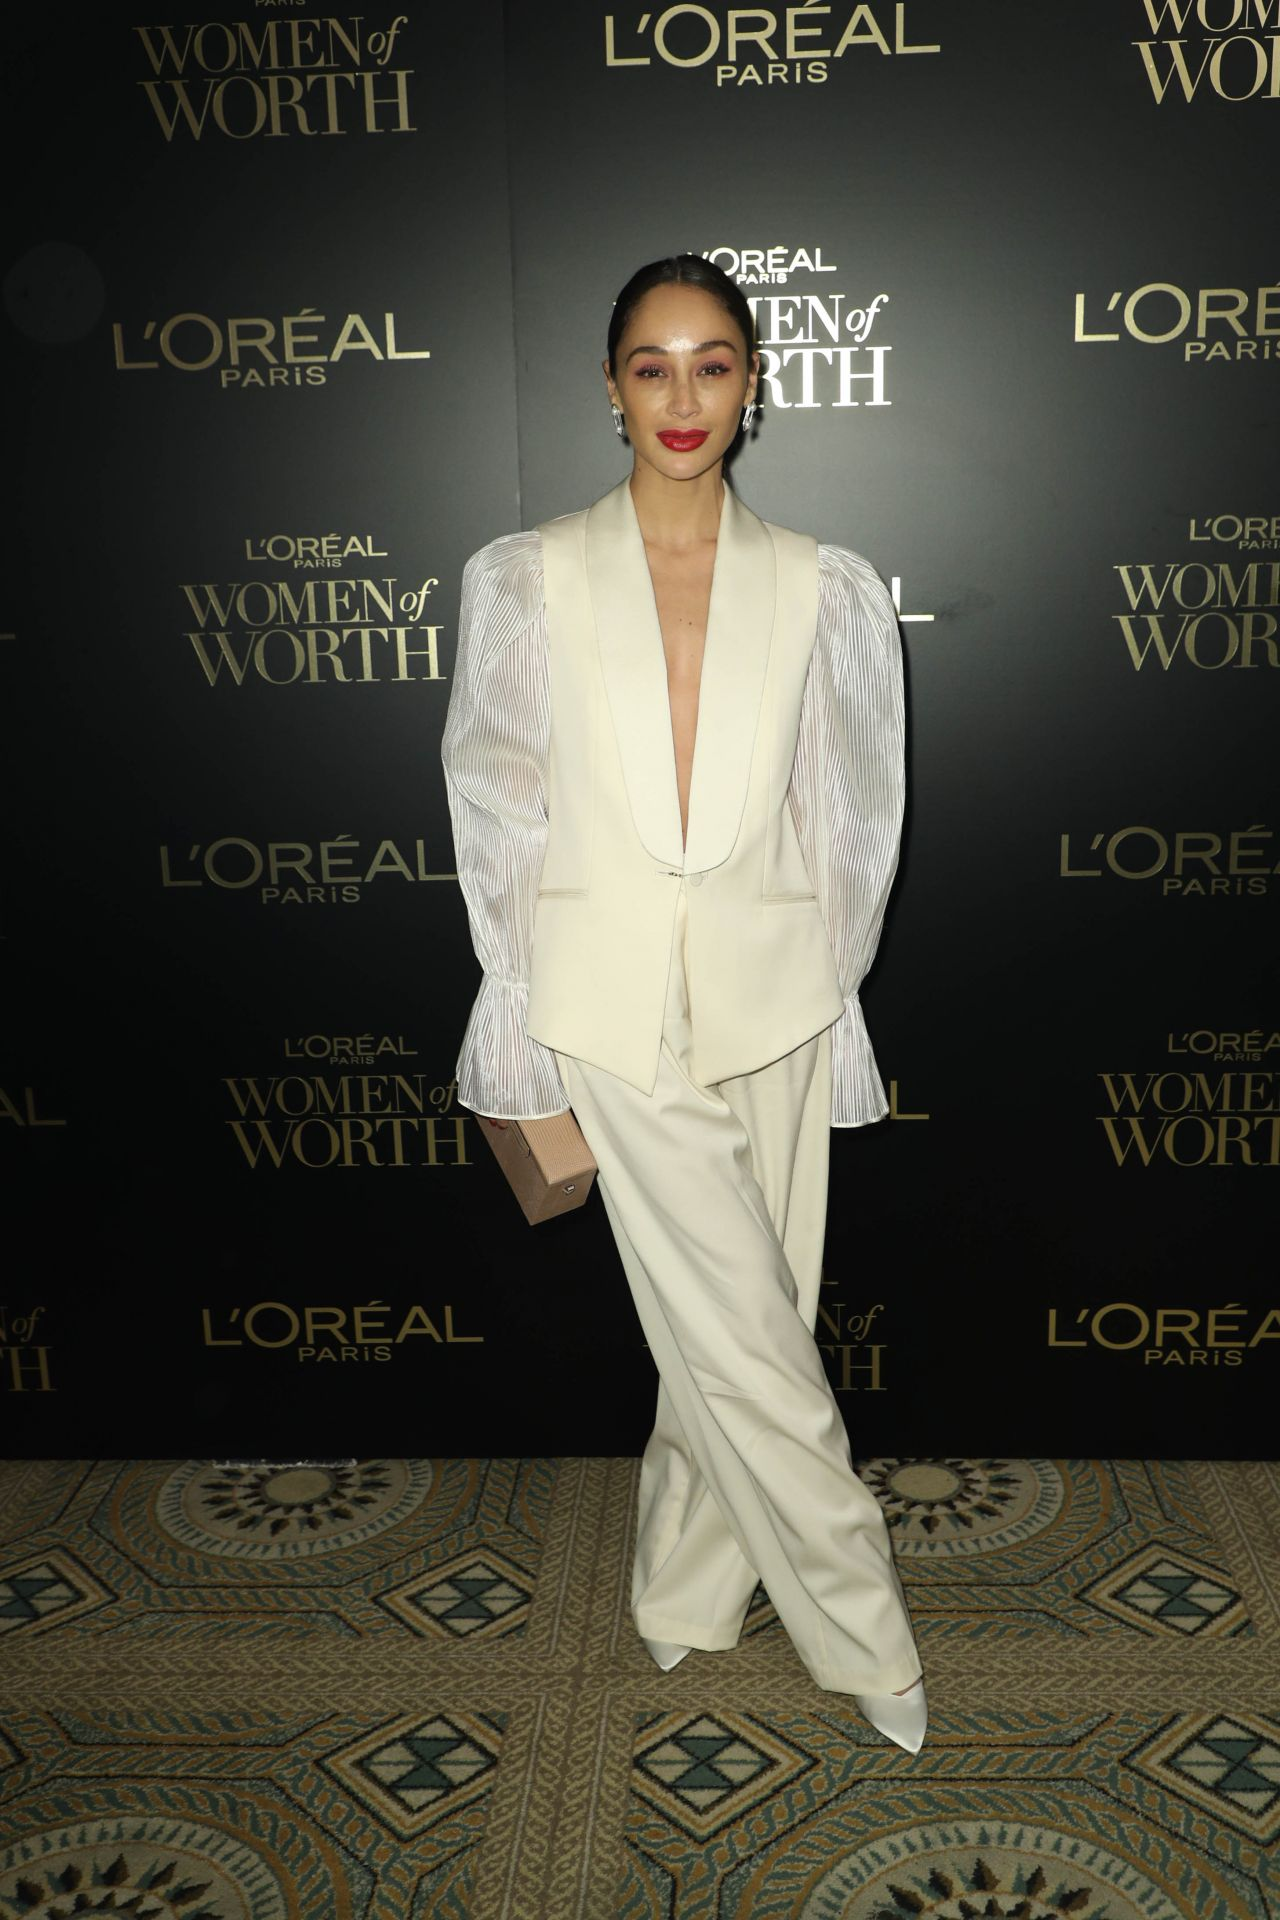 cara-santana-in-styland-2019-loreal-paris-women-of-worth-awards